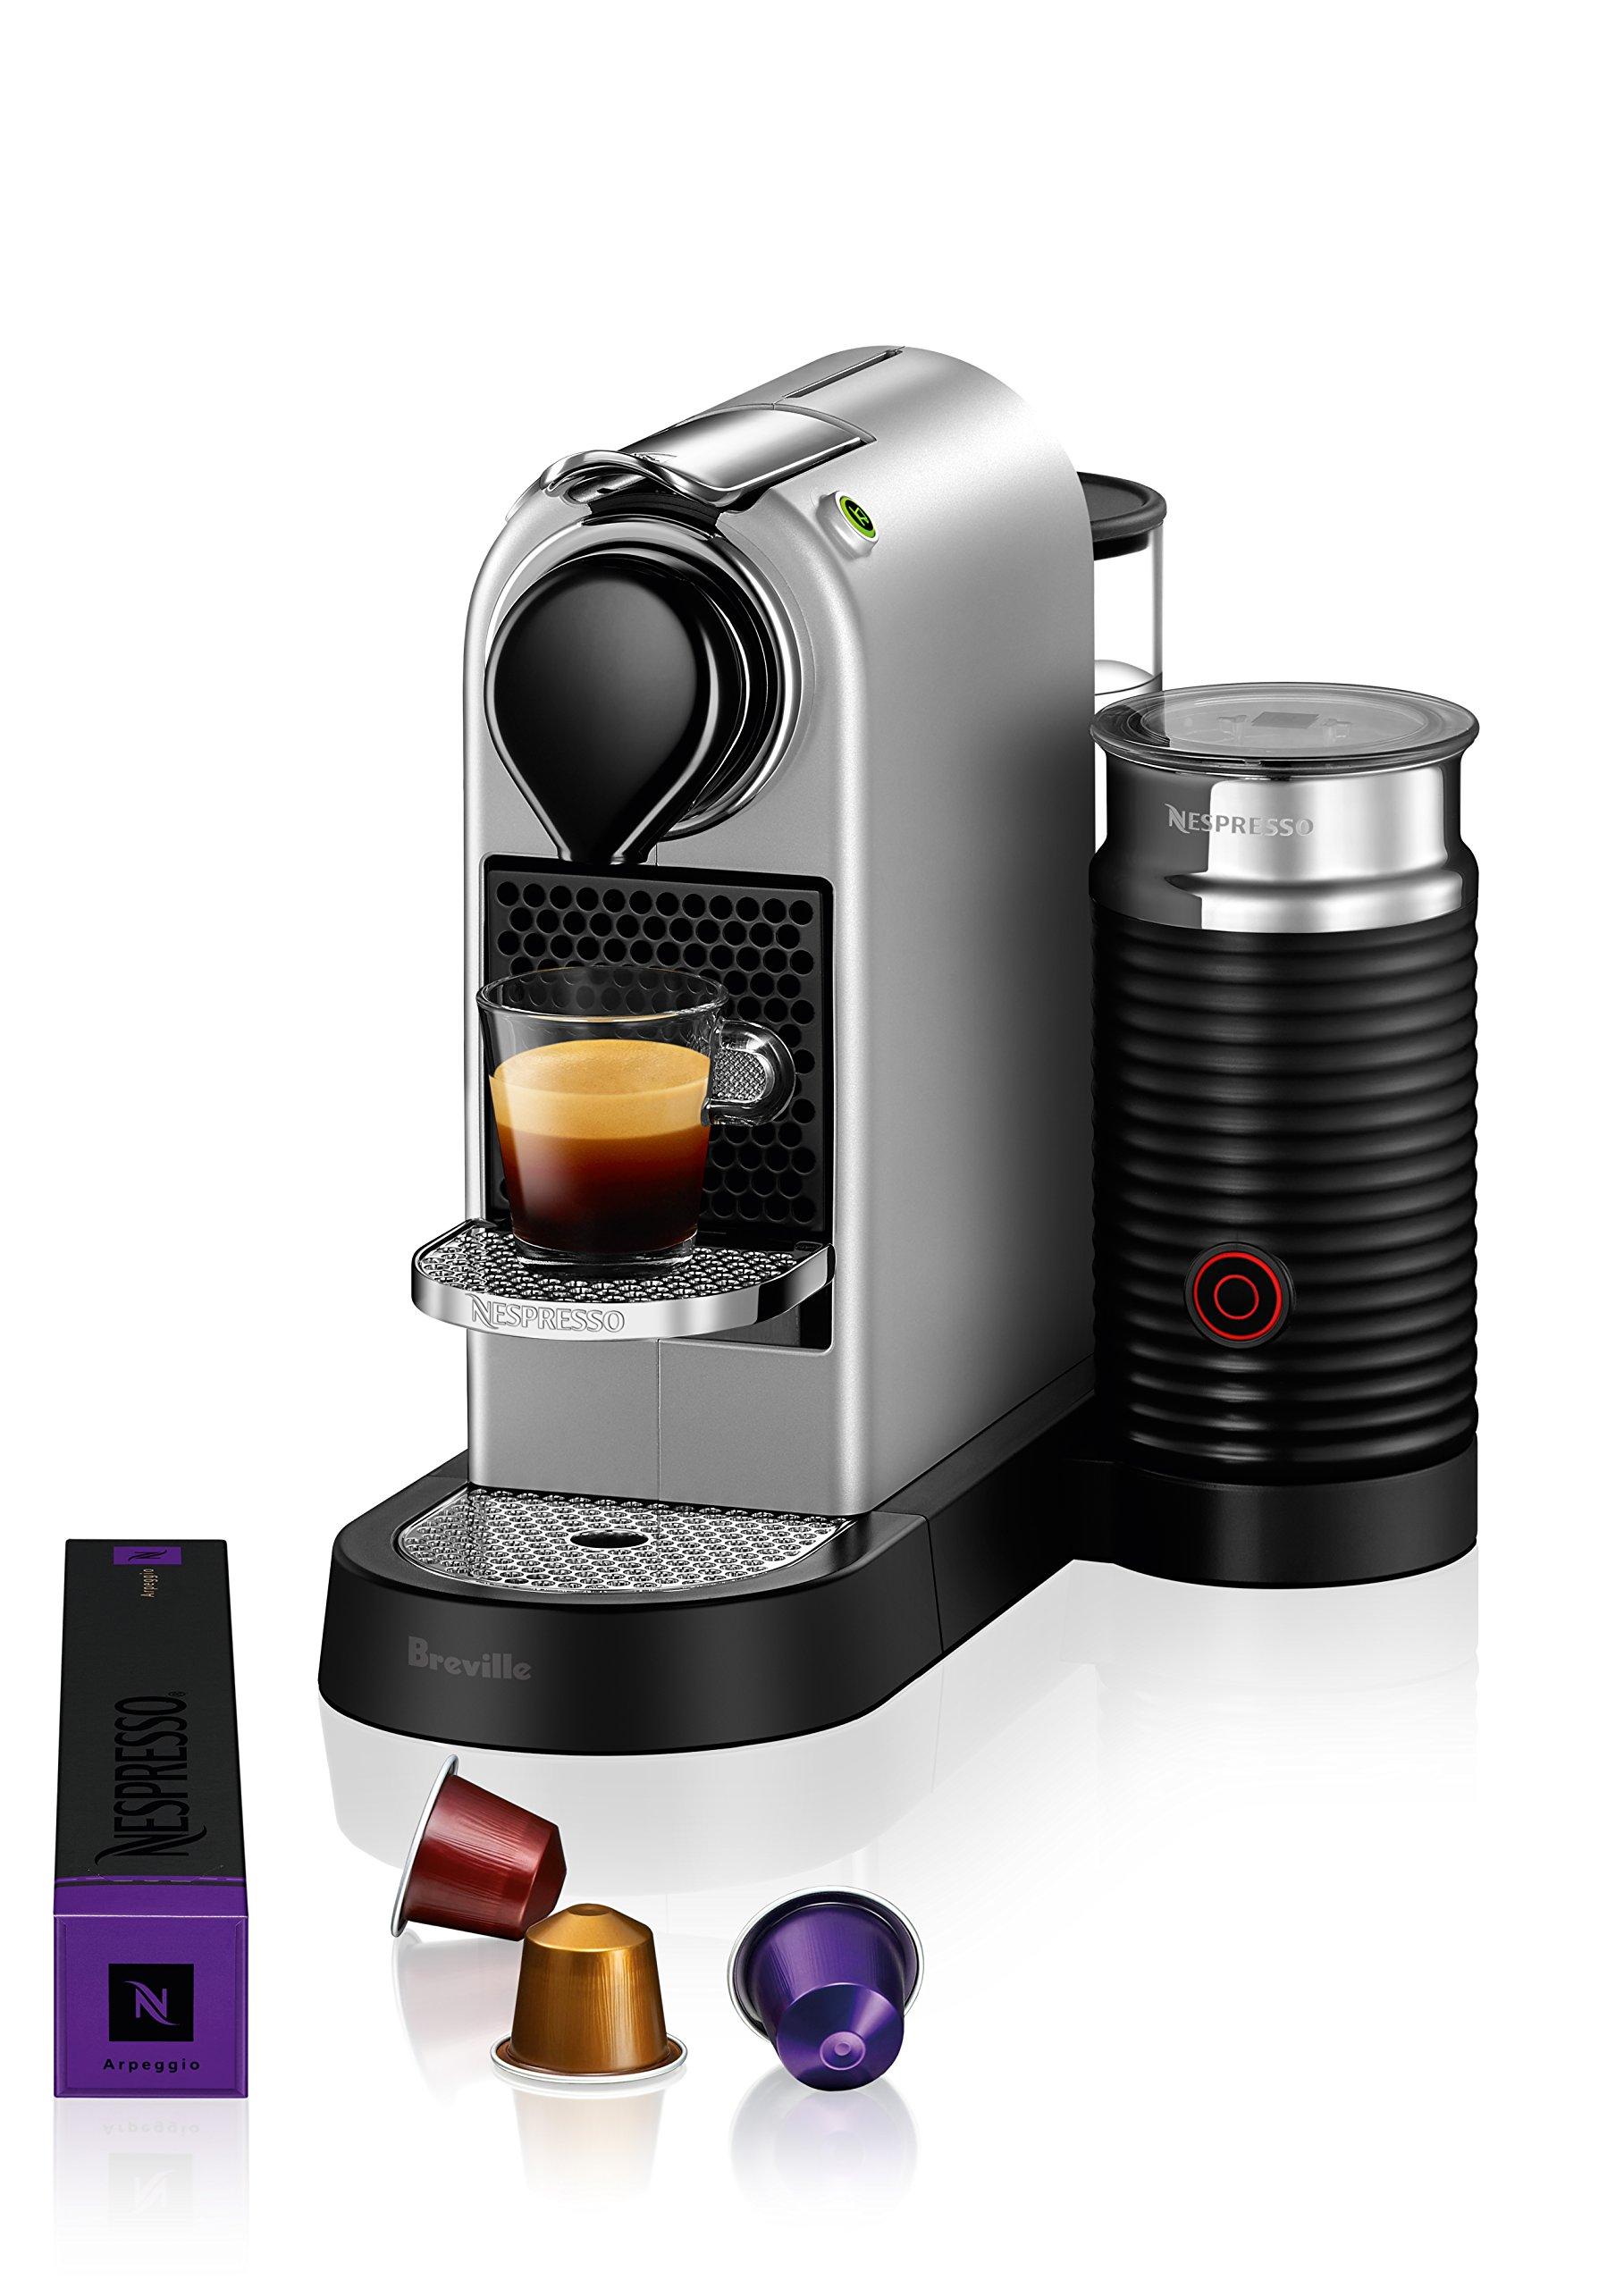 Nespresso CitiZ Original Espresso Machine with Aeroccino Milk Frother Bundle by Breville, Silver